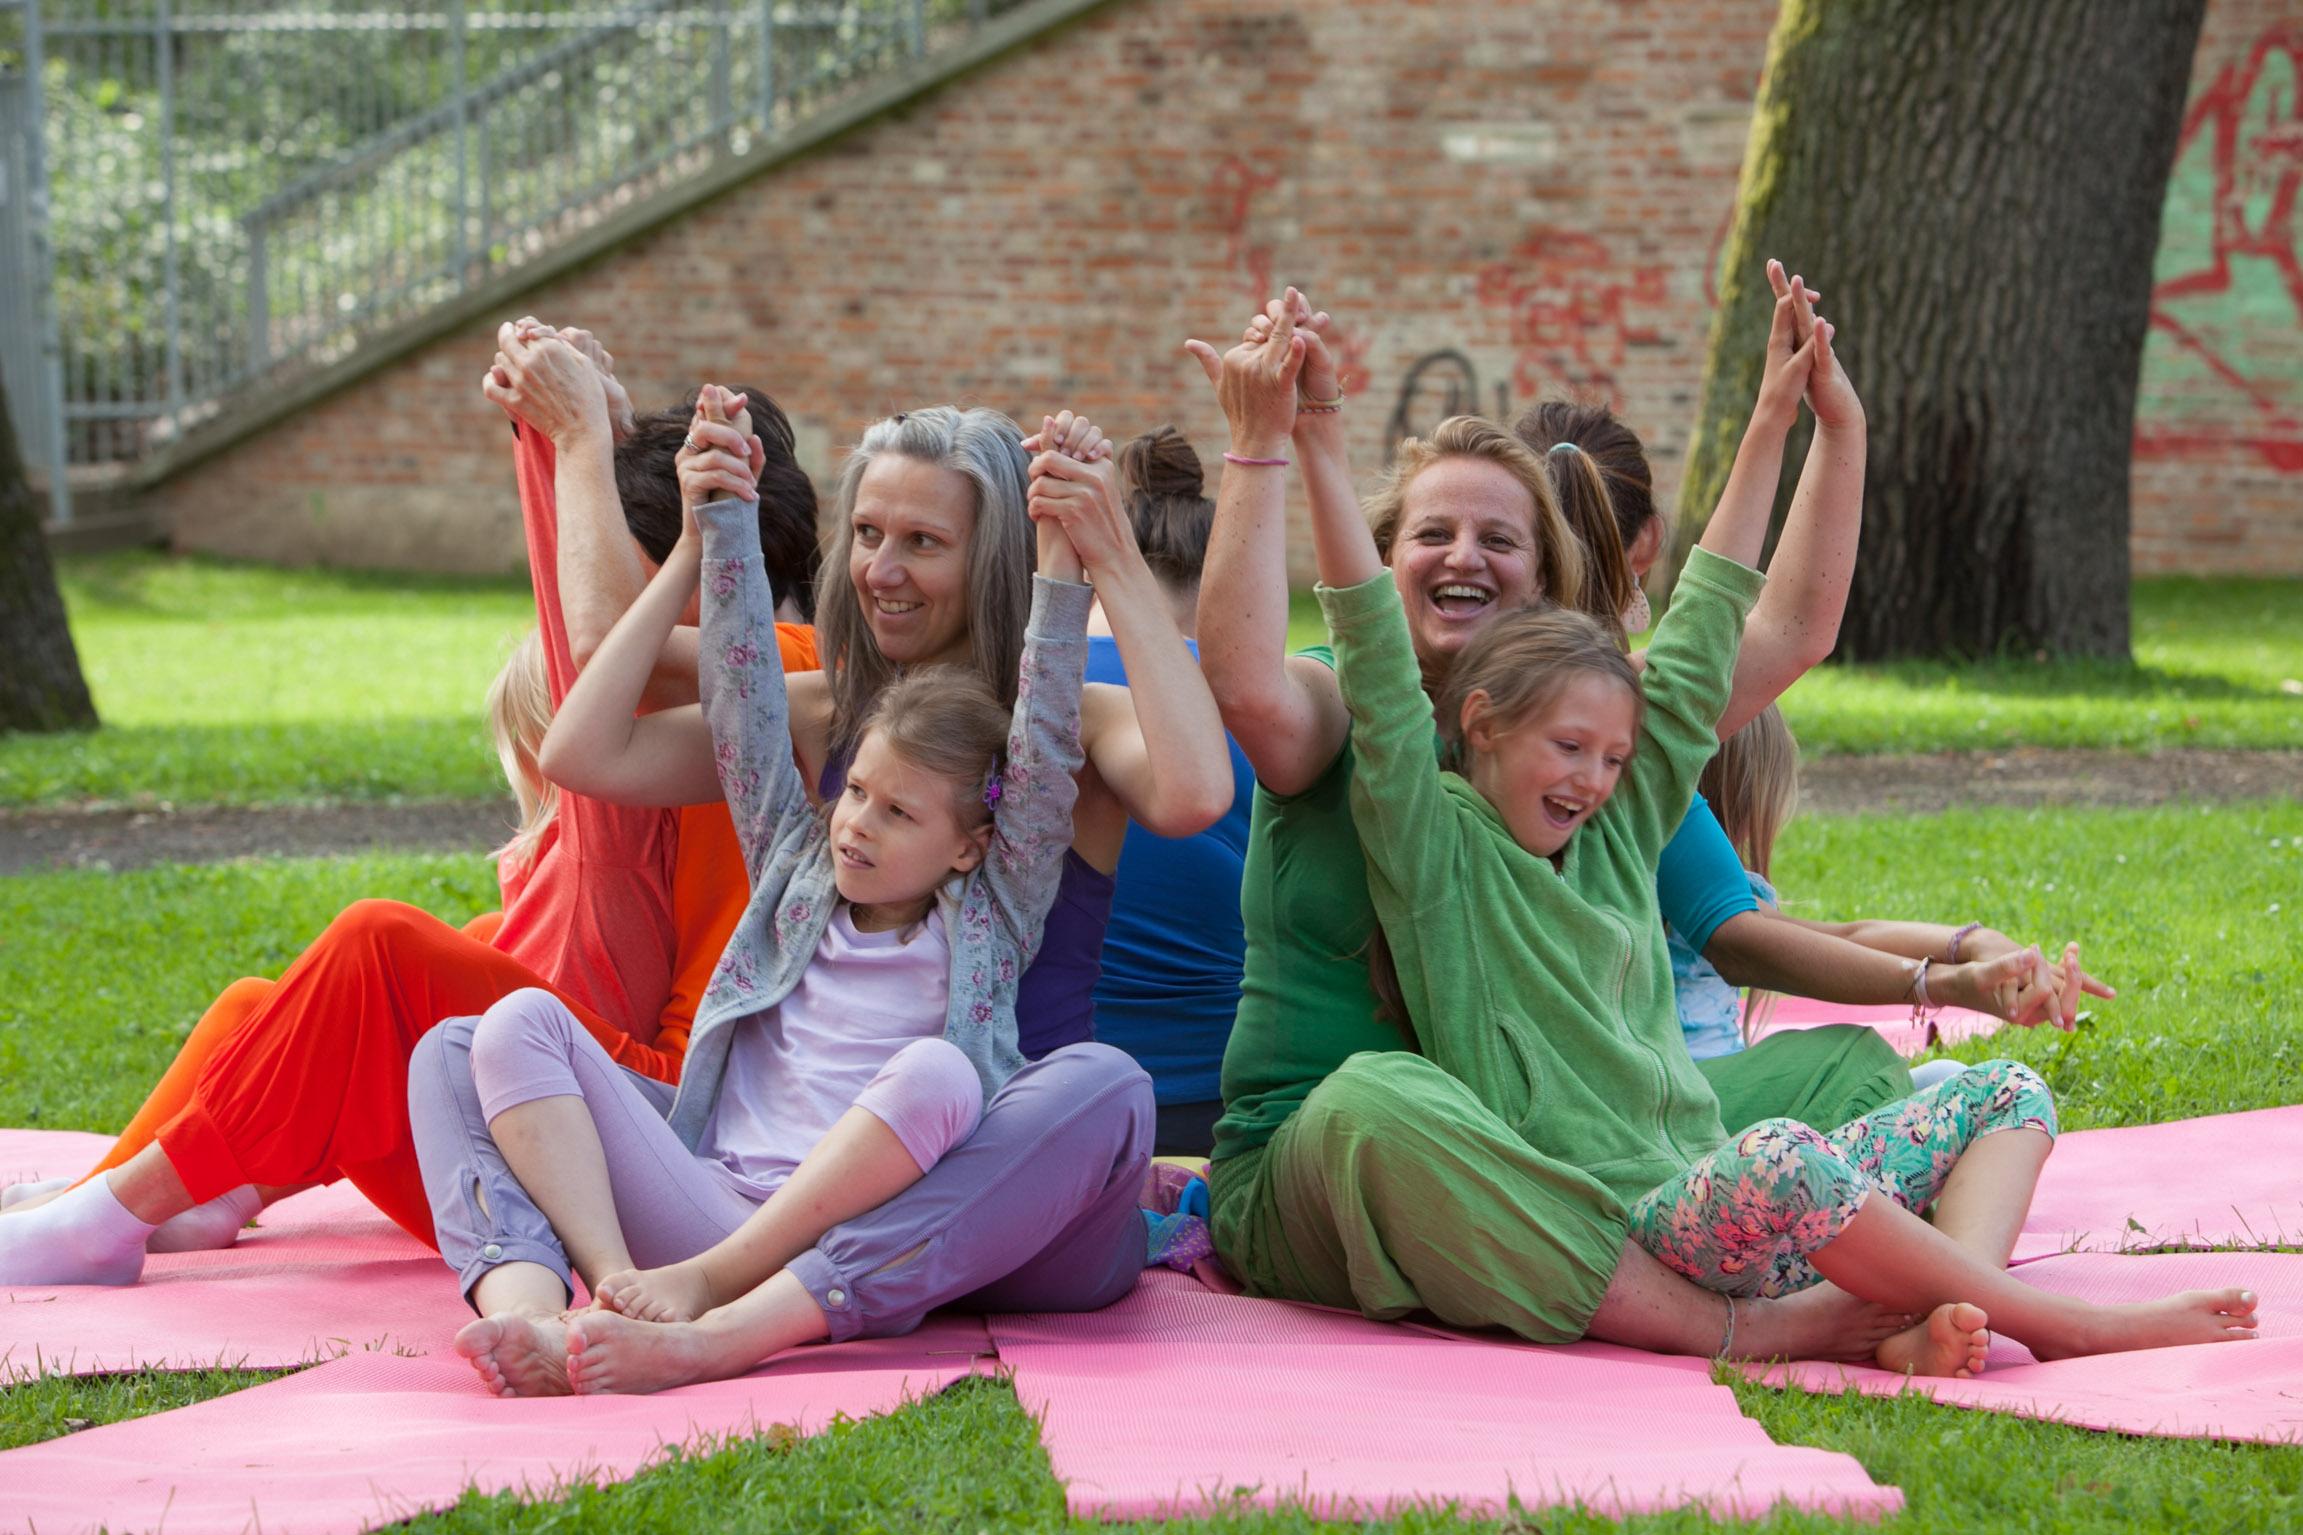 Foto: Kinderyoga, Mütter mit Töchtern beim Kinderyoga im Stadtpark Graz